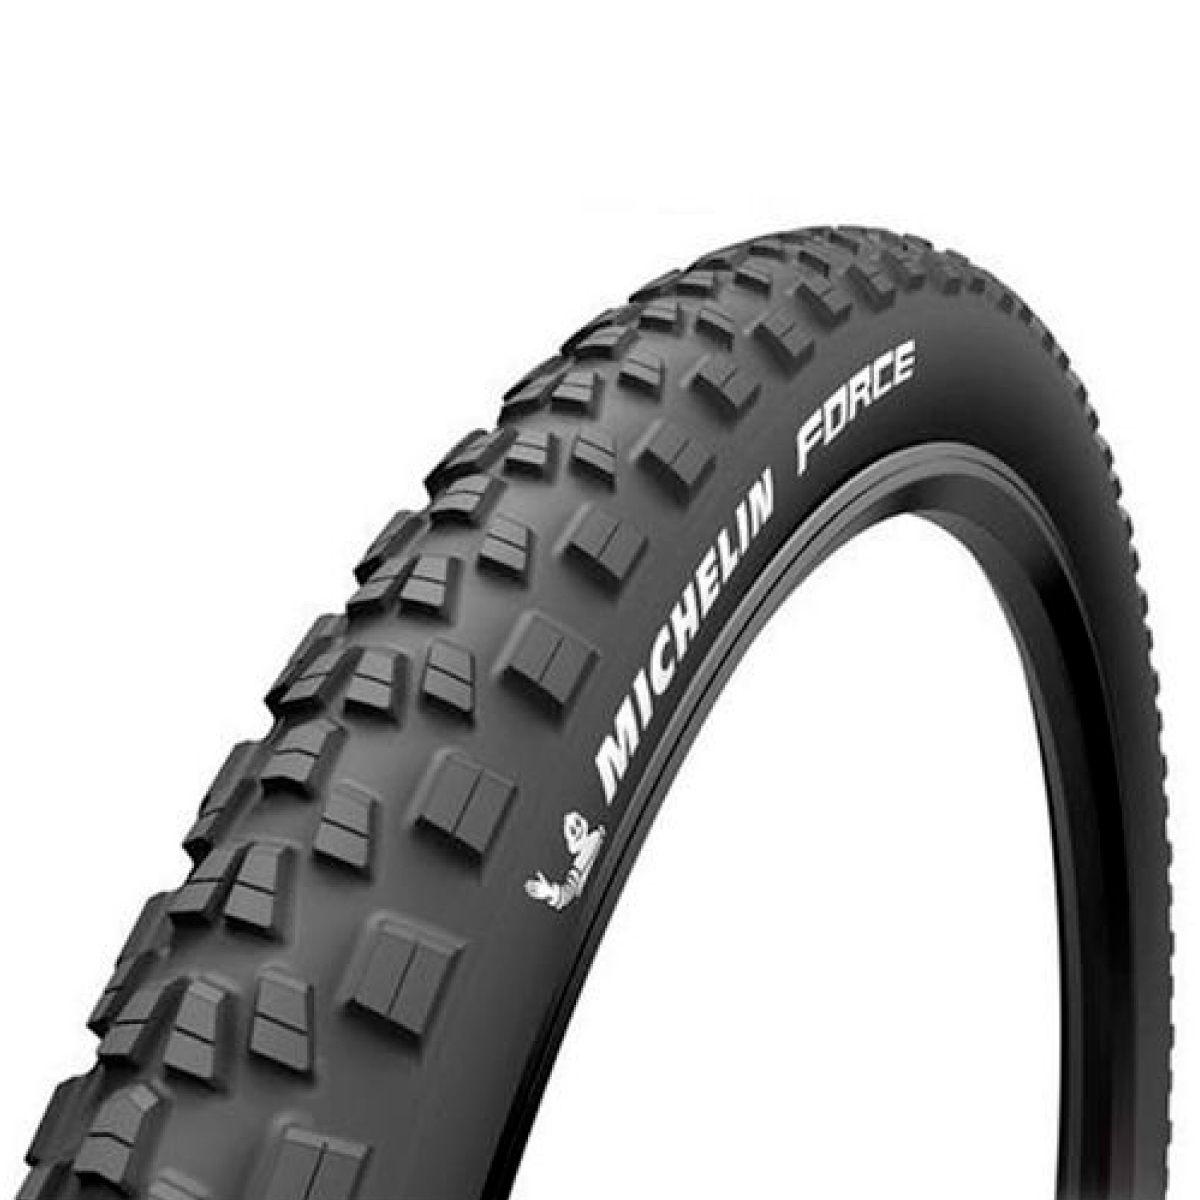 Pneu 29x2.25 Michelin Force Access Line Talao Rigido